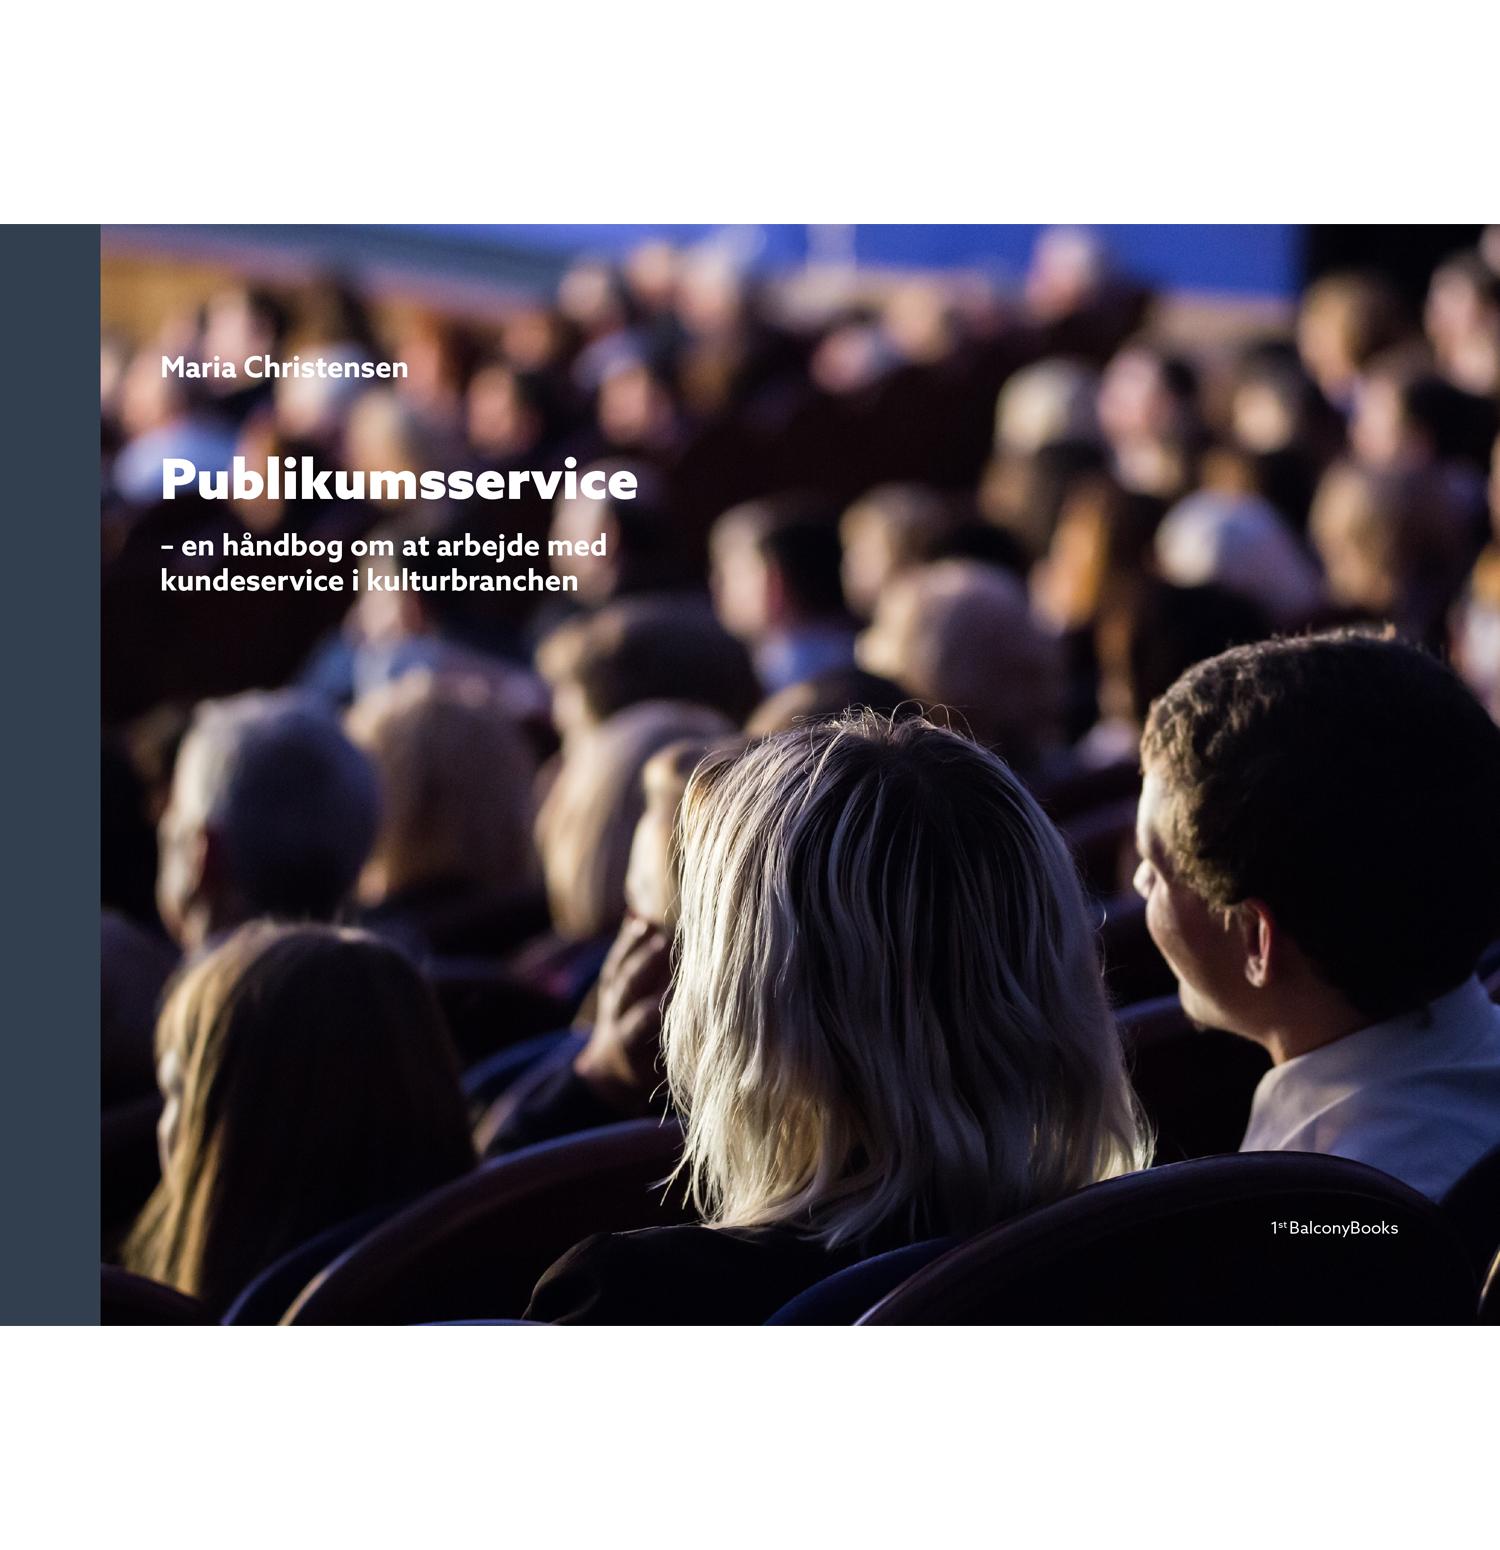 Publikumsservice - Maria Christensen - Bøger - 1st Balcony Books - 9788797190203 - March 23, 2020